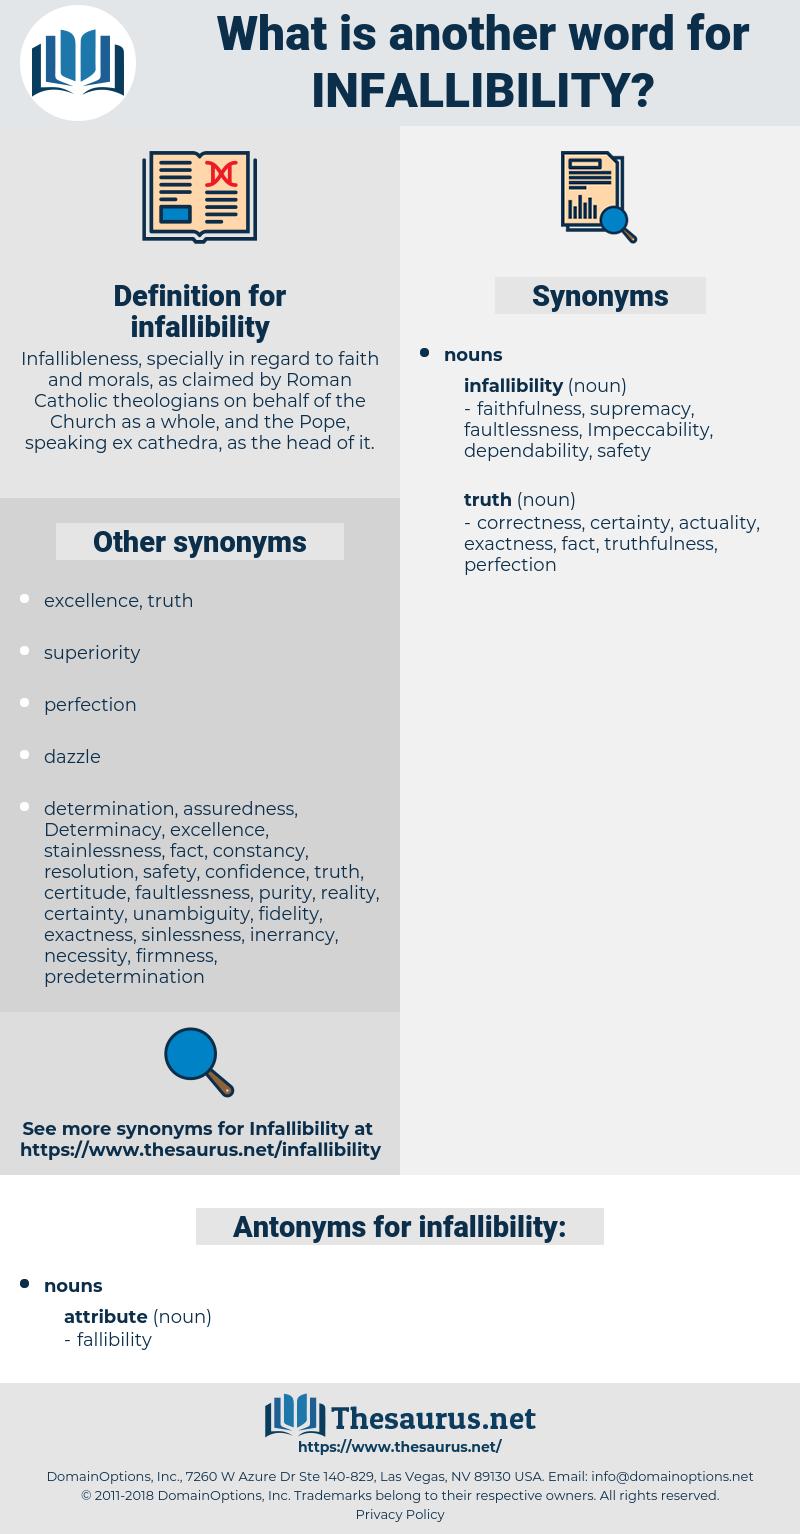 infallibility, synonym infallibility, another word for infallibility, words like infallibility, thesaurus infallibility